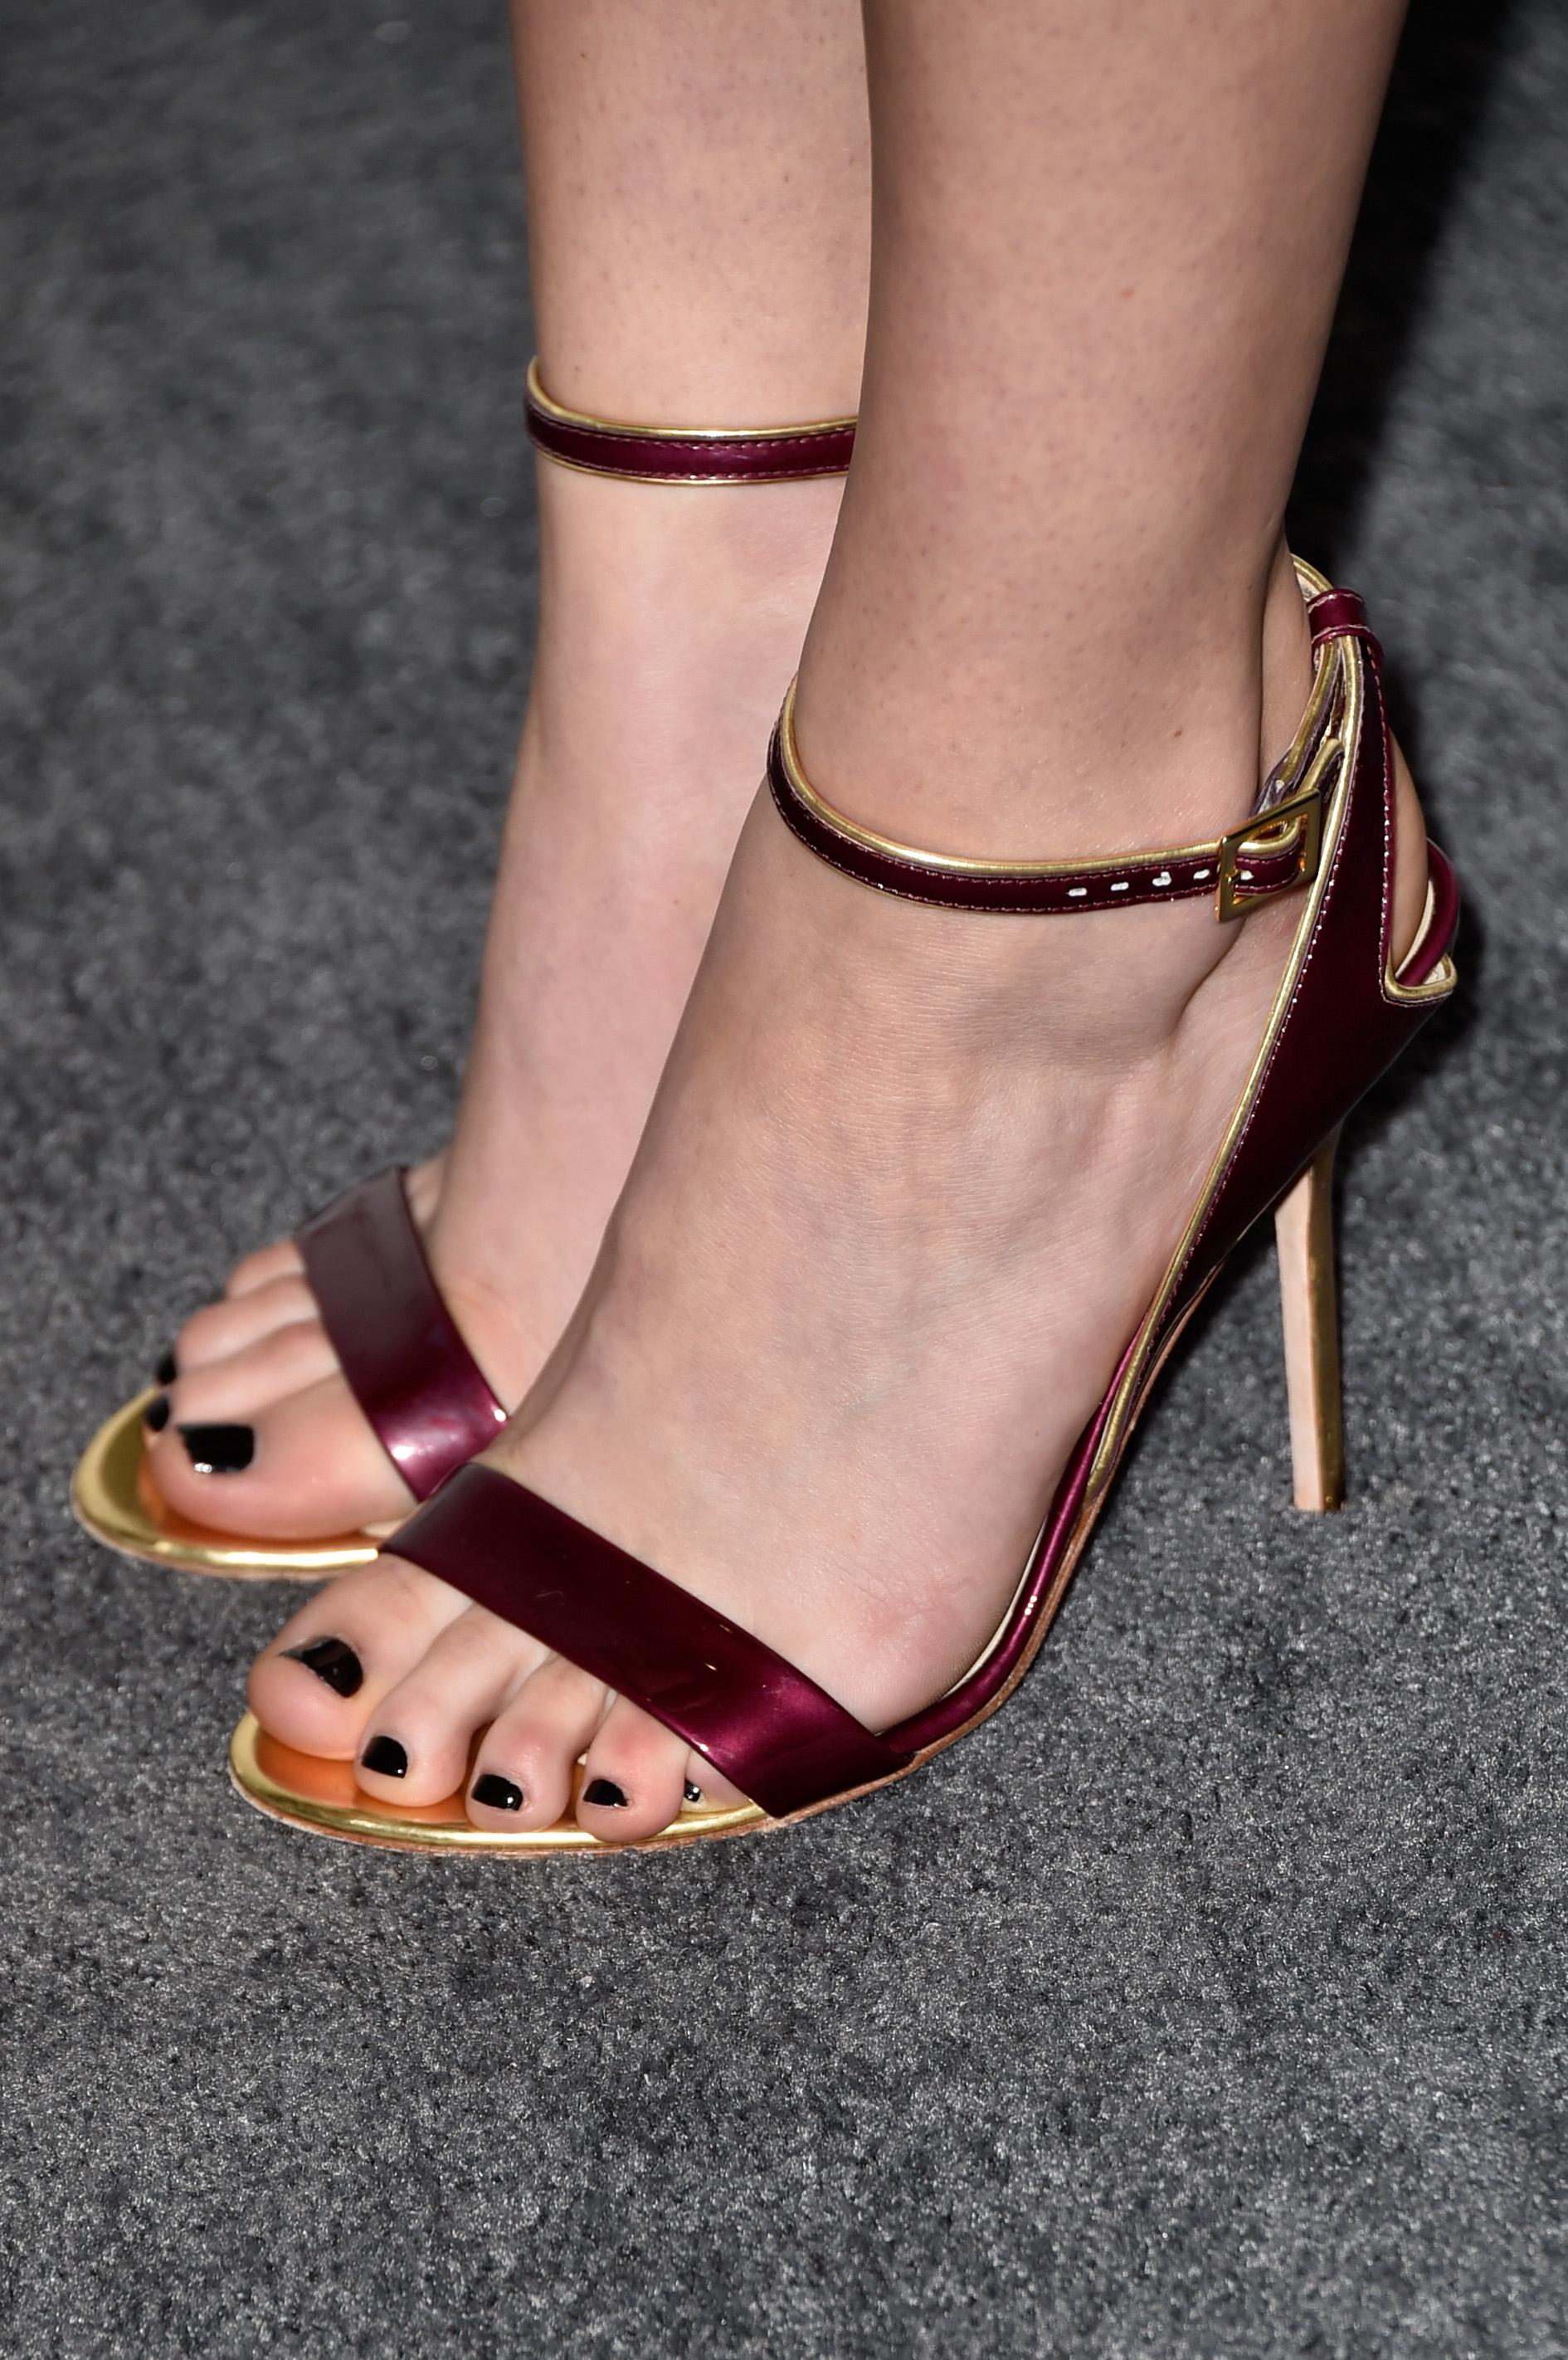 Liana Liberato's Feet